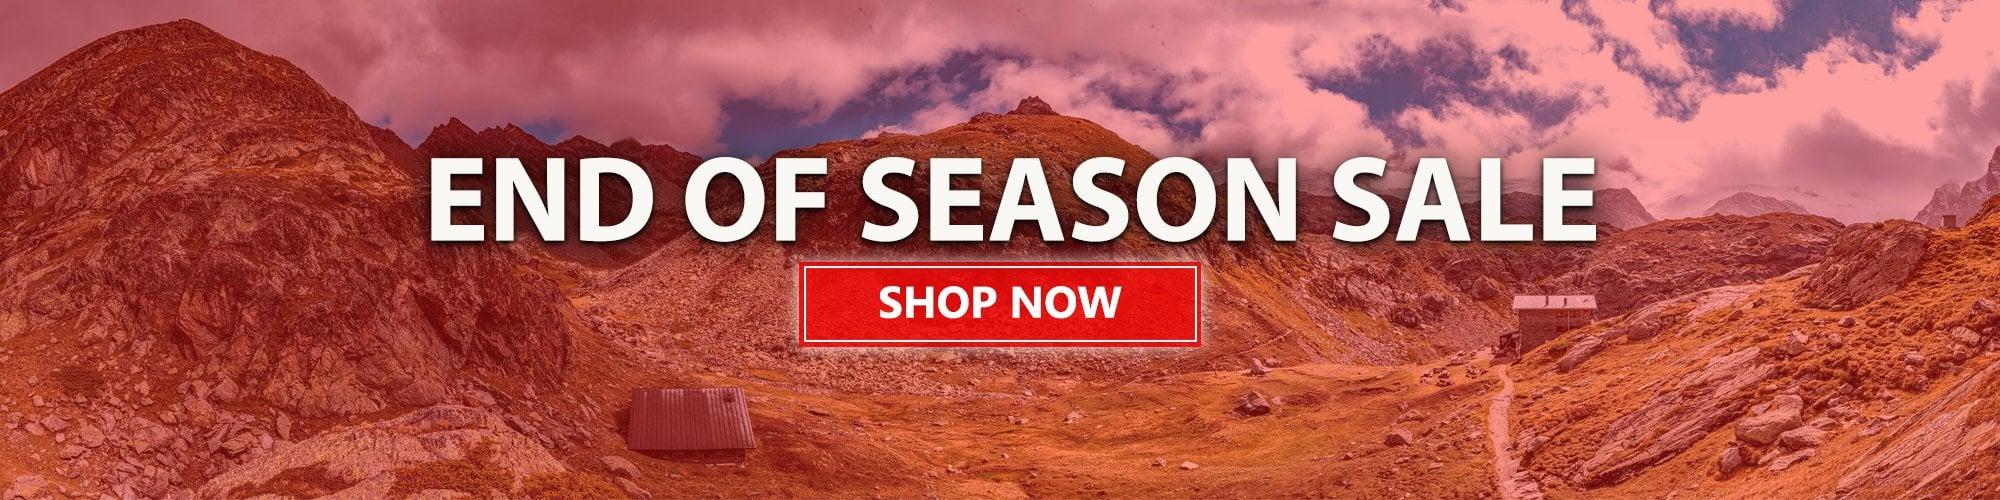 End of Season Sale - Summer 2020